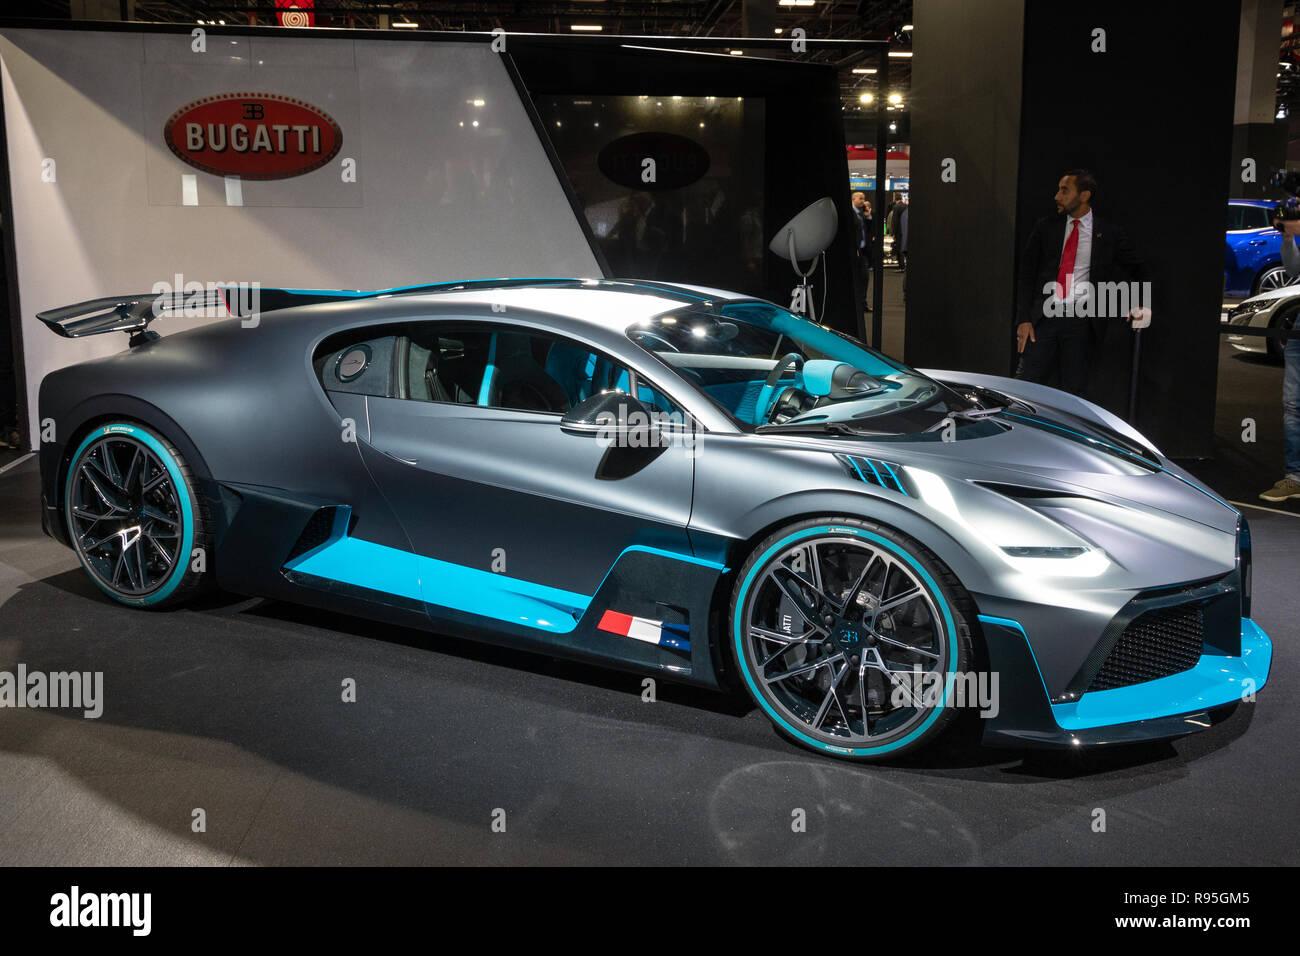 Paris Oct 3 2018 New 2020 Bugatti Divo Extreme Hypercar Showcased At The Paris Motor Show Stock Photo Alamy